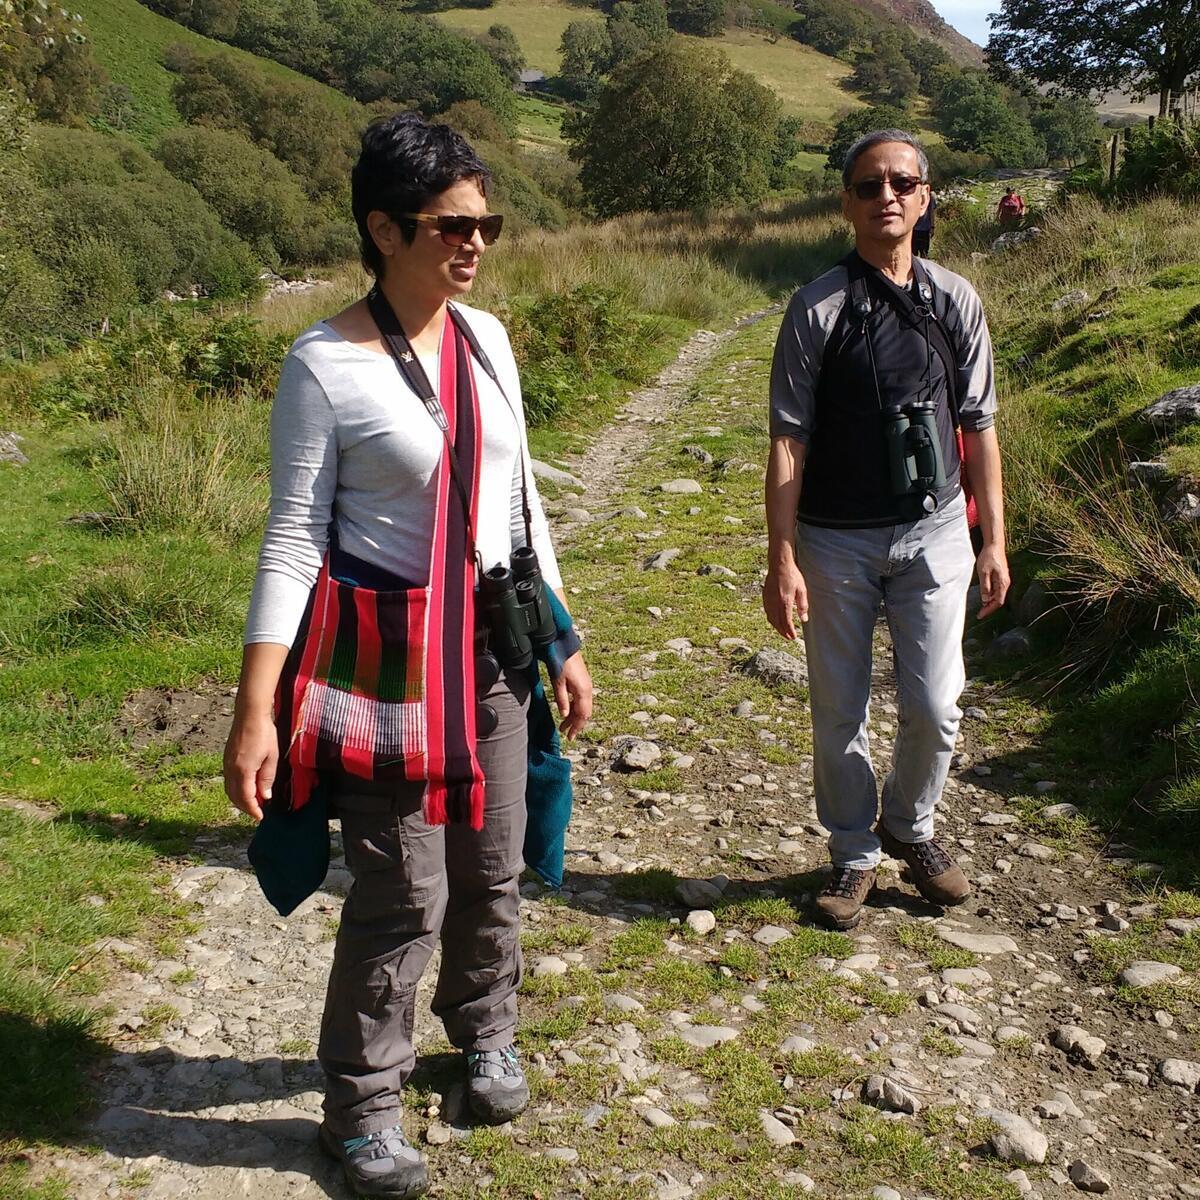 Elan Valley Priscilla and John on the move